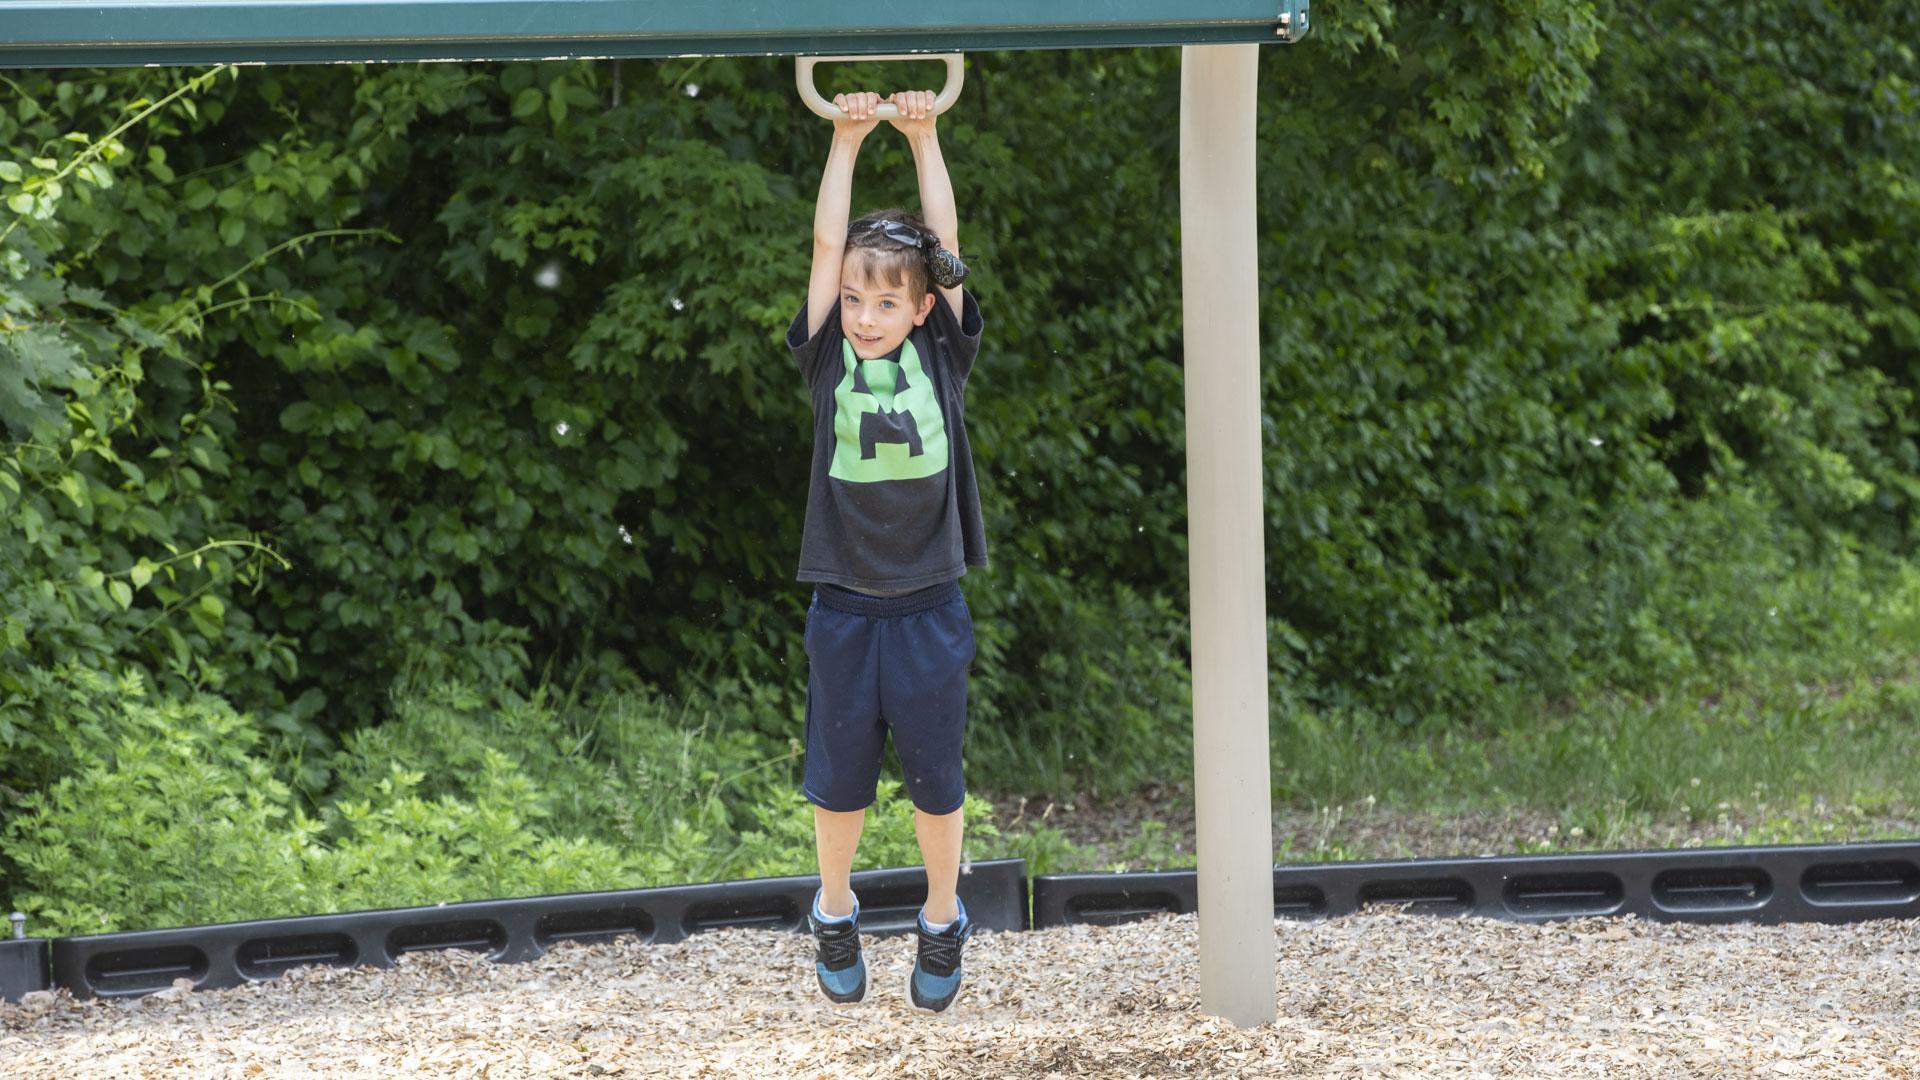 Boy hanging from playground equipment